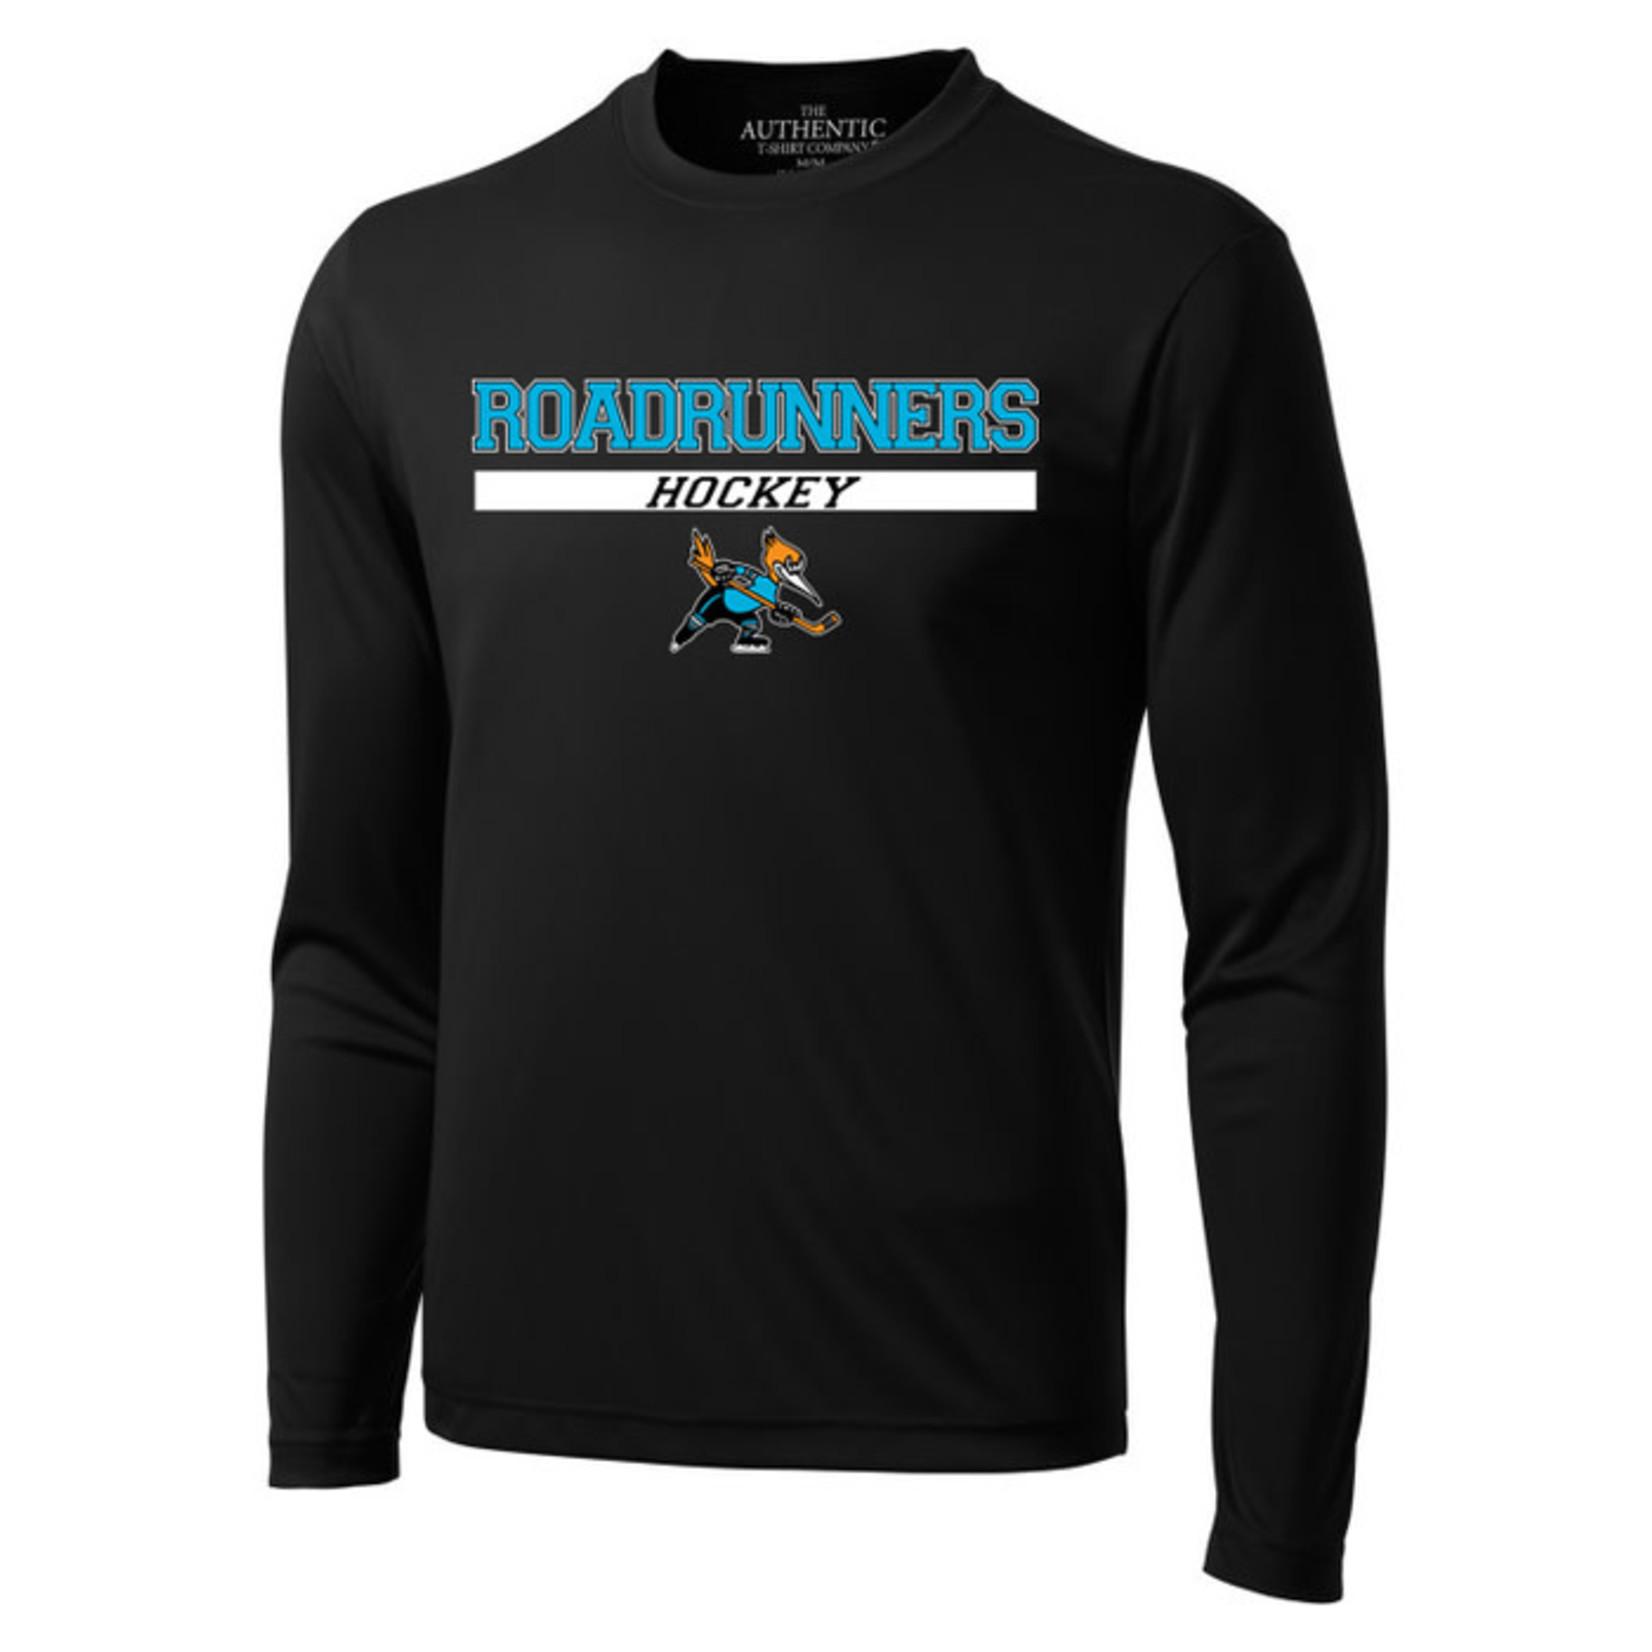 Roadrunner Tech Tee Long Sleeve adult